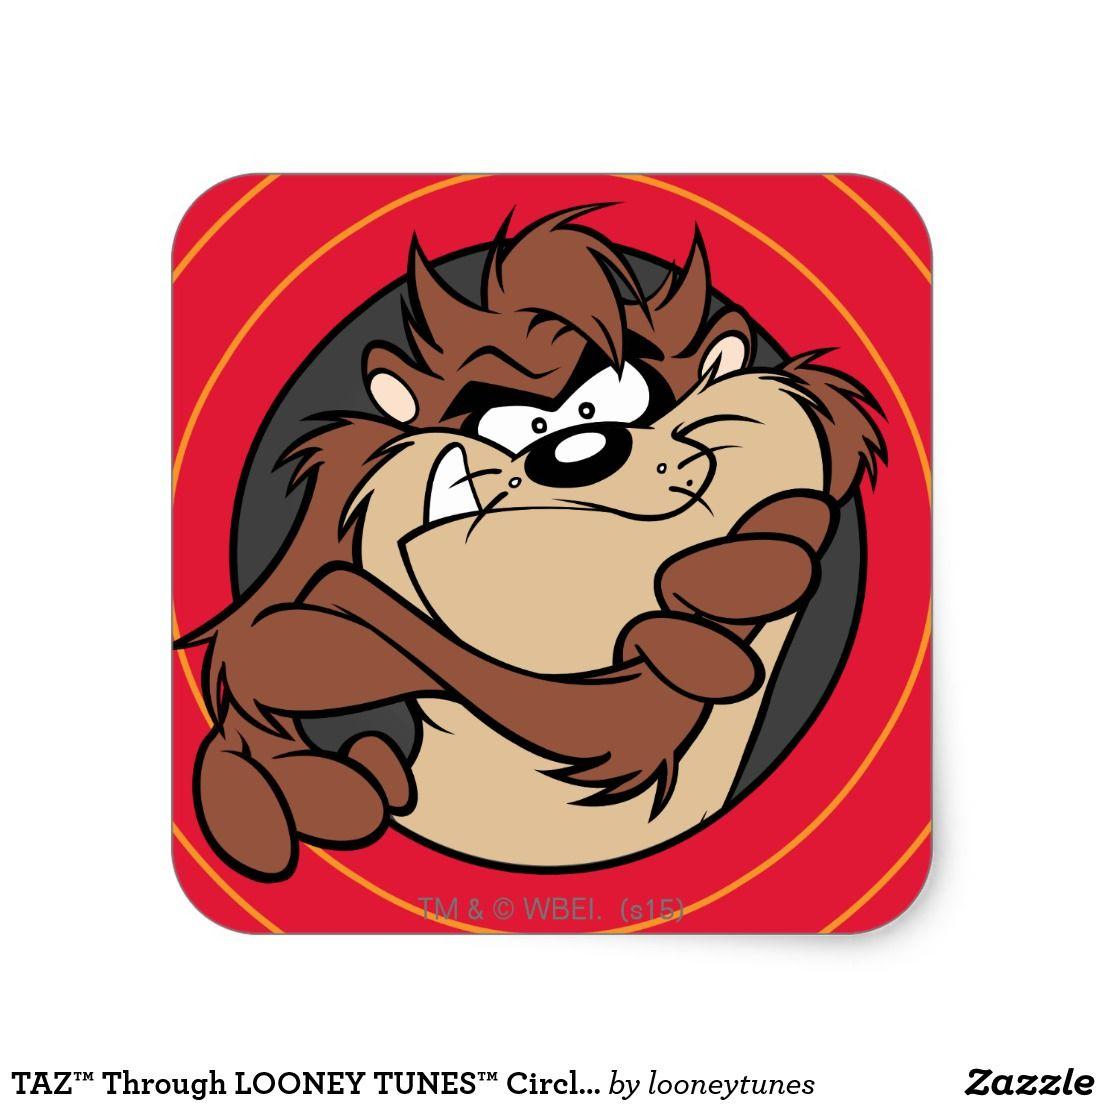 Taz Through Looney Tunes Circles Square Sticker Zazzle Com